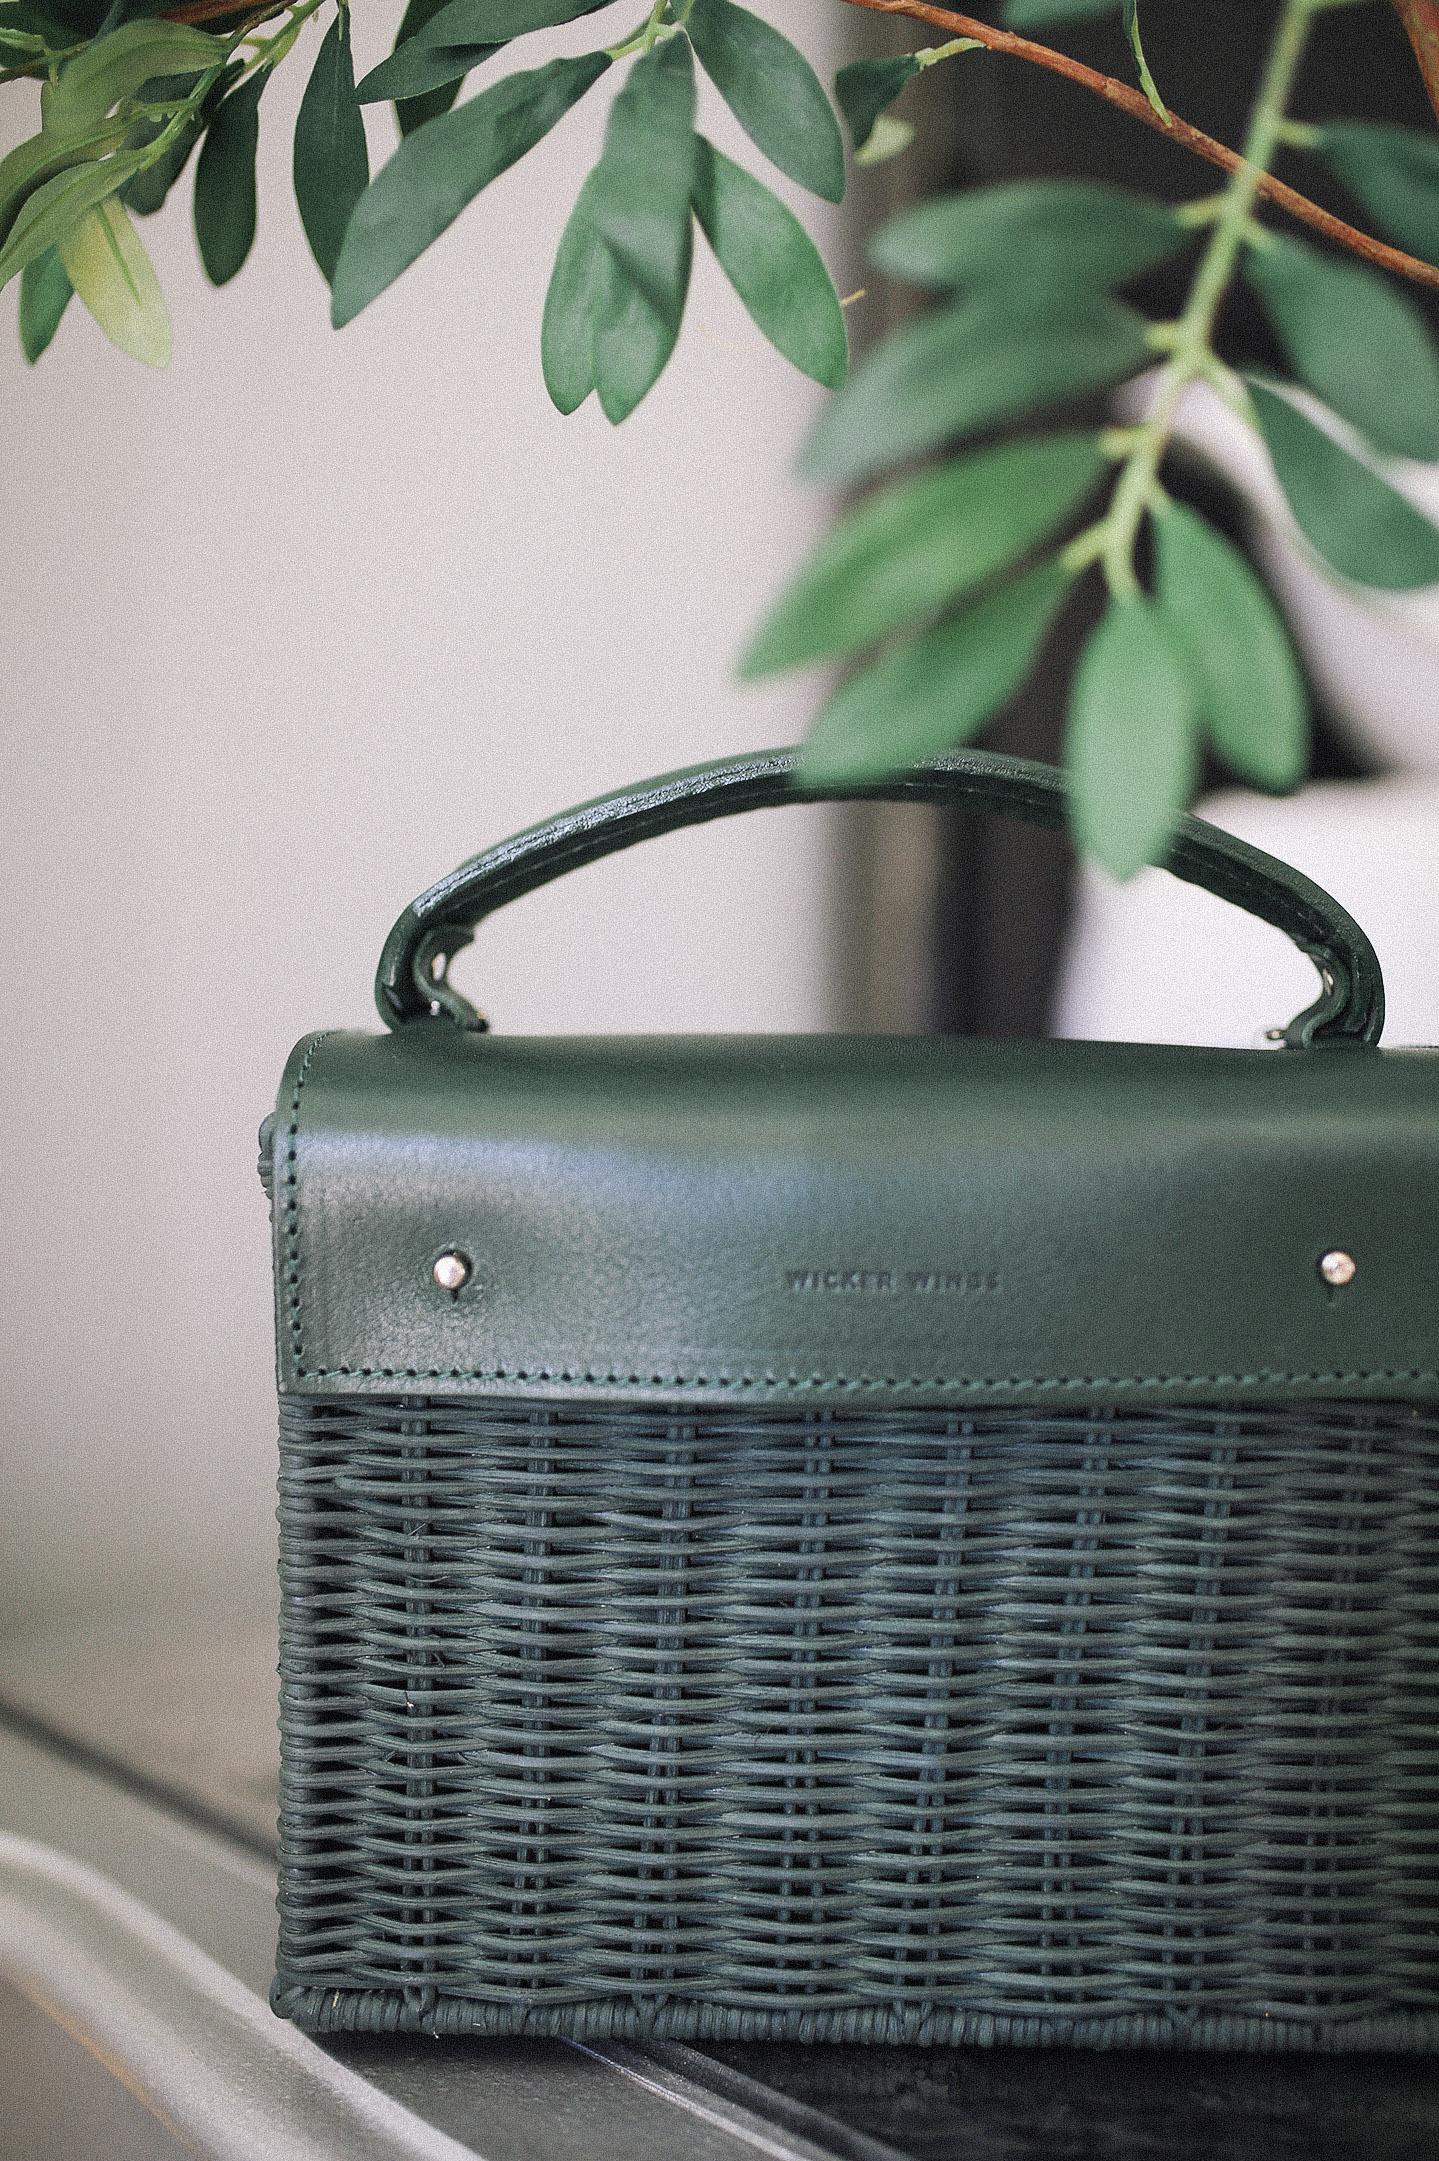 Wicker Handbags for Fall